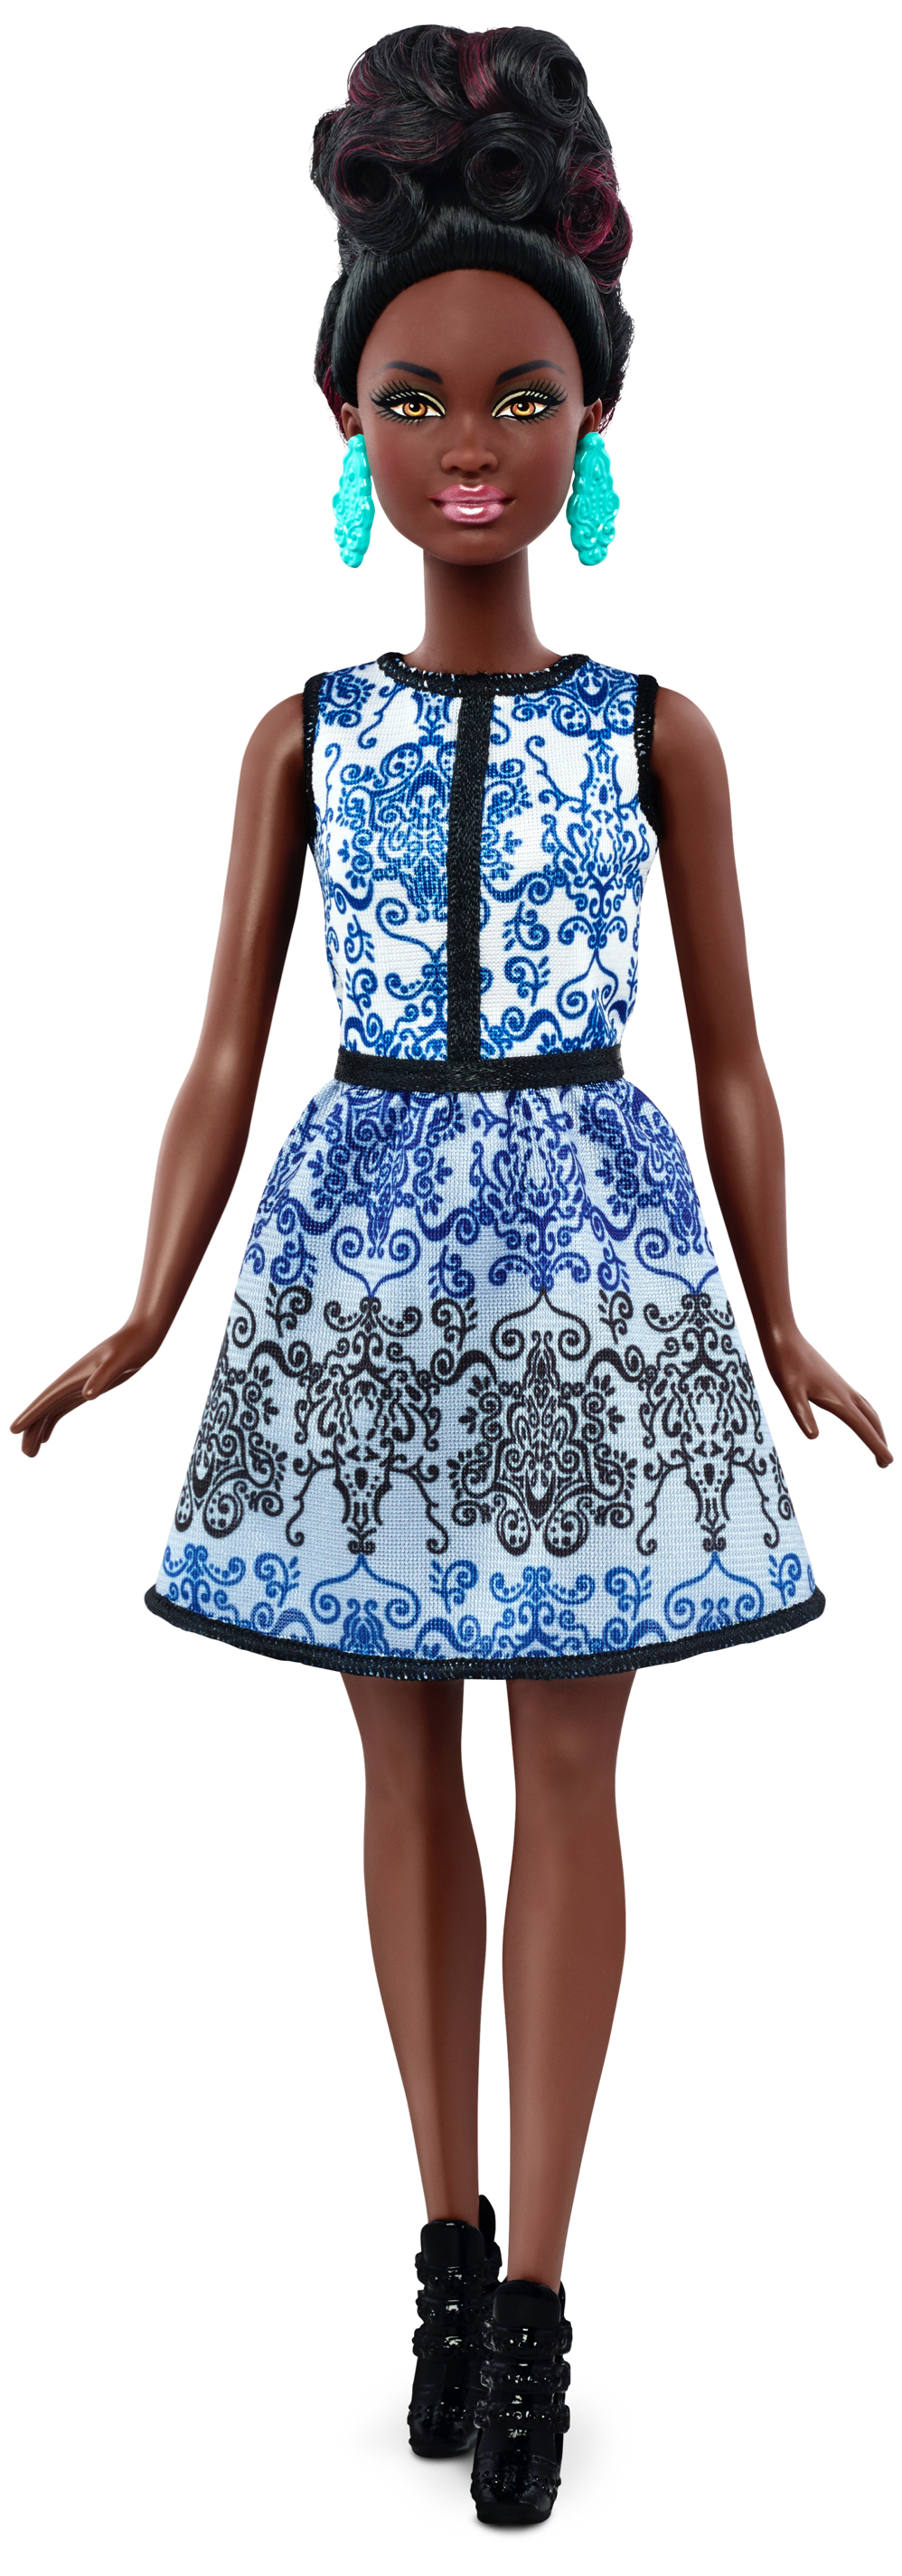 8th graduation grade dresses tumblr, Light sleeveless blue lace dress